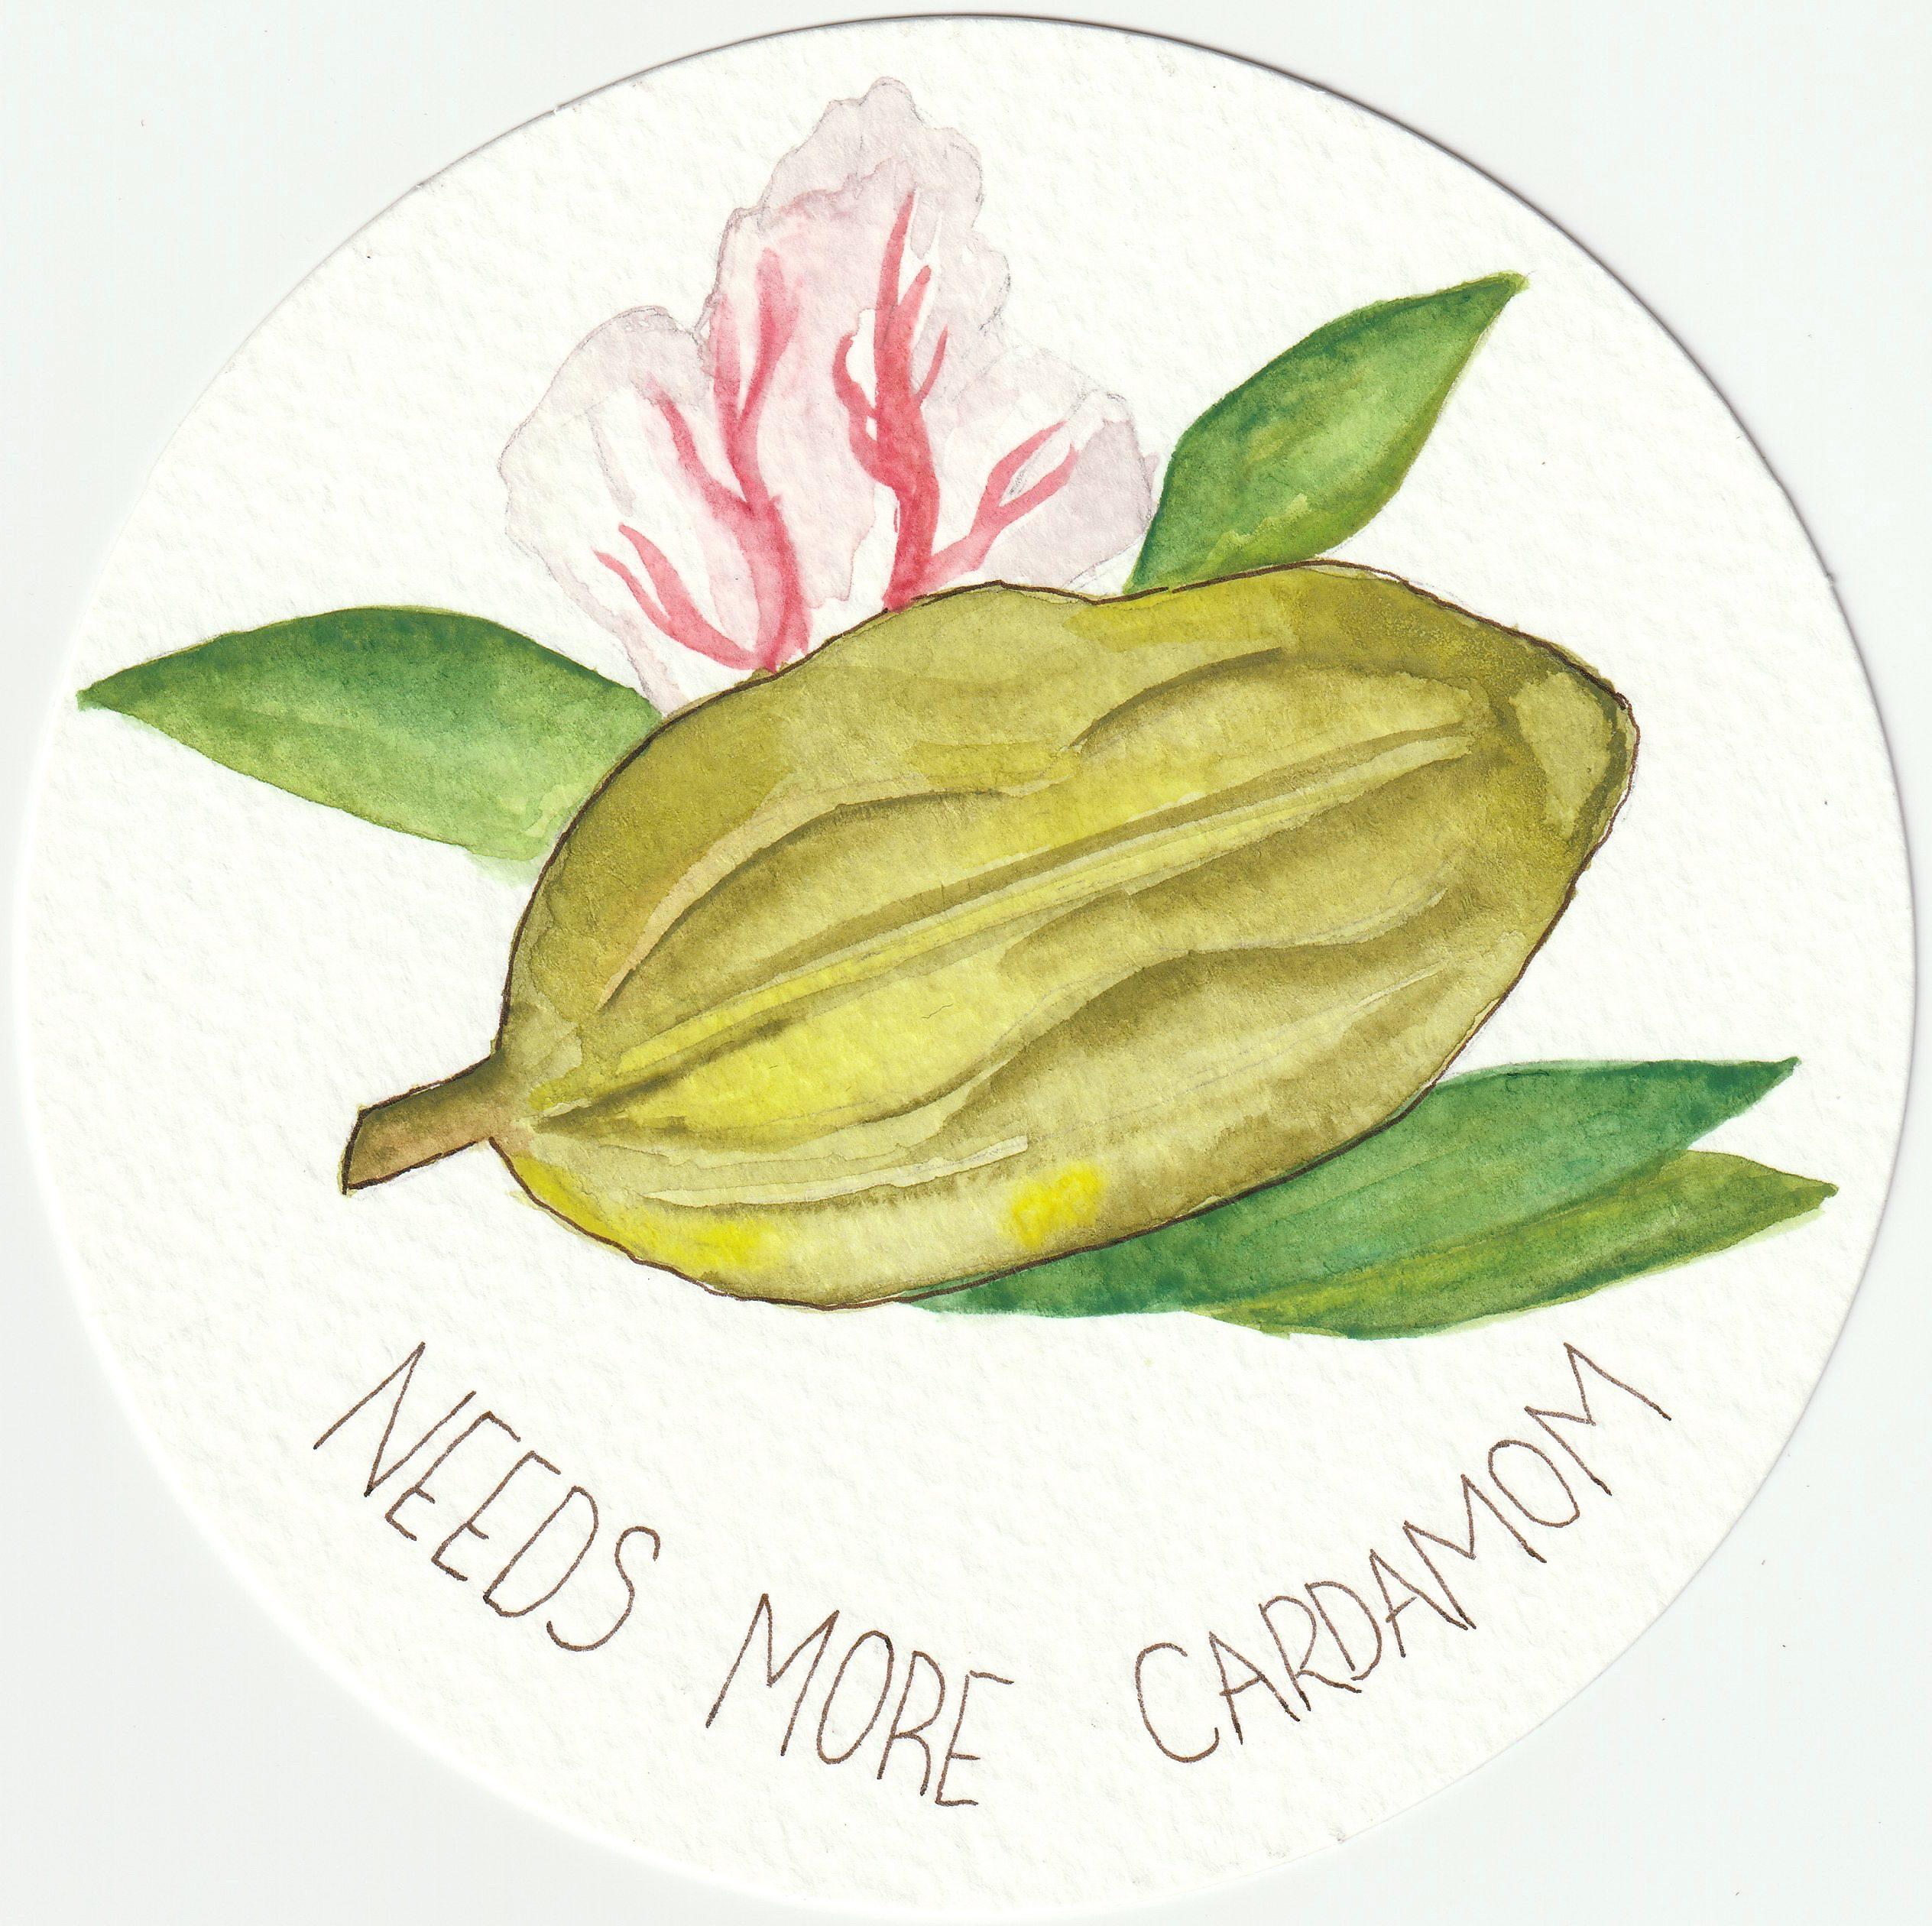 Needs More Cardamom